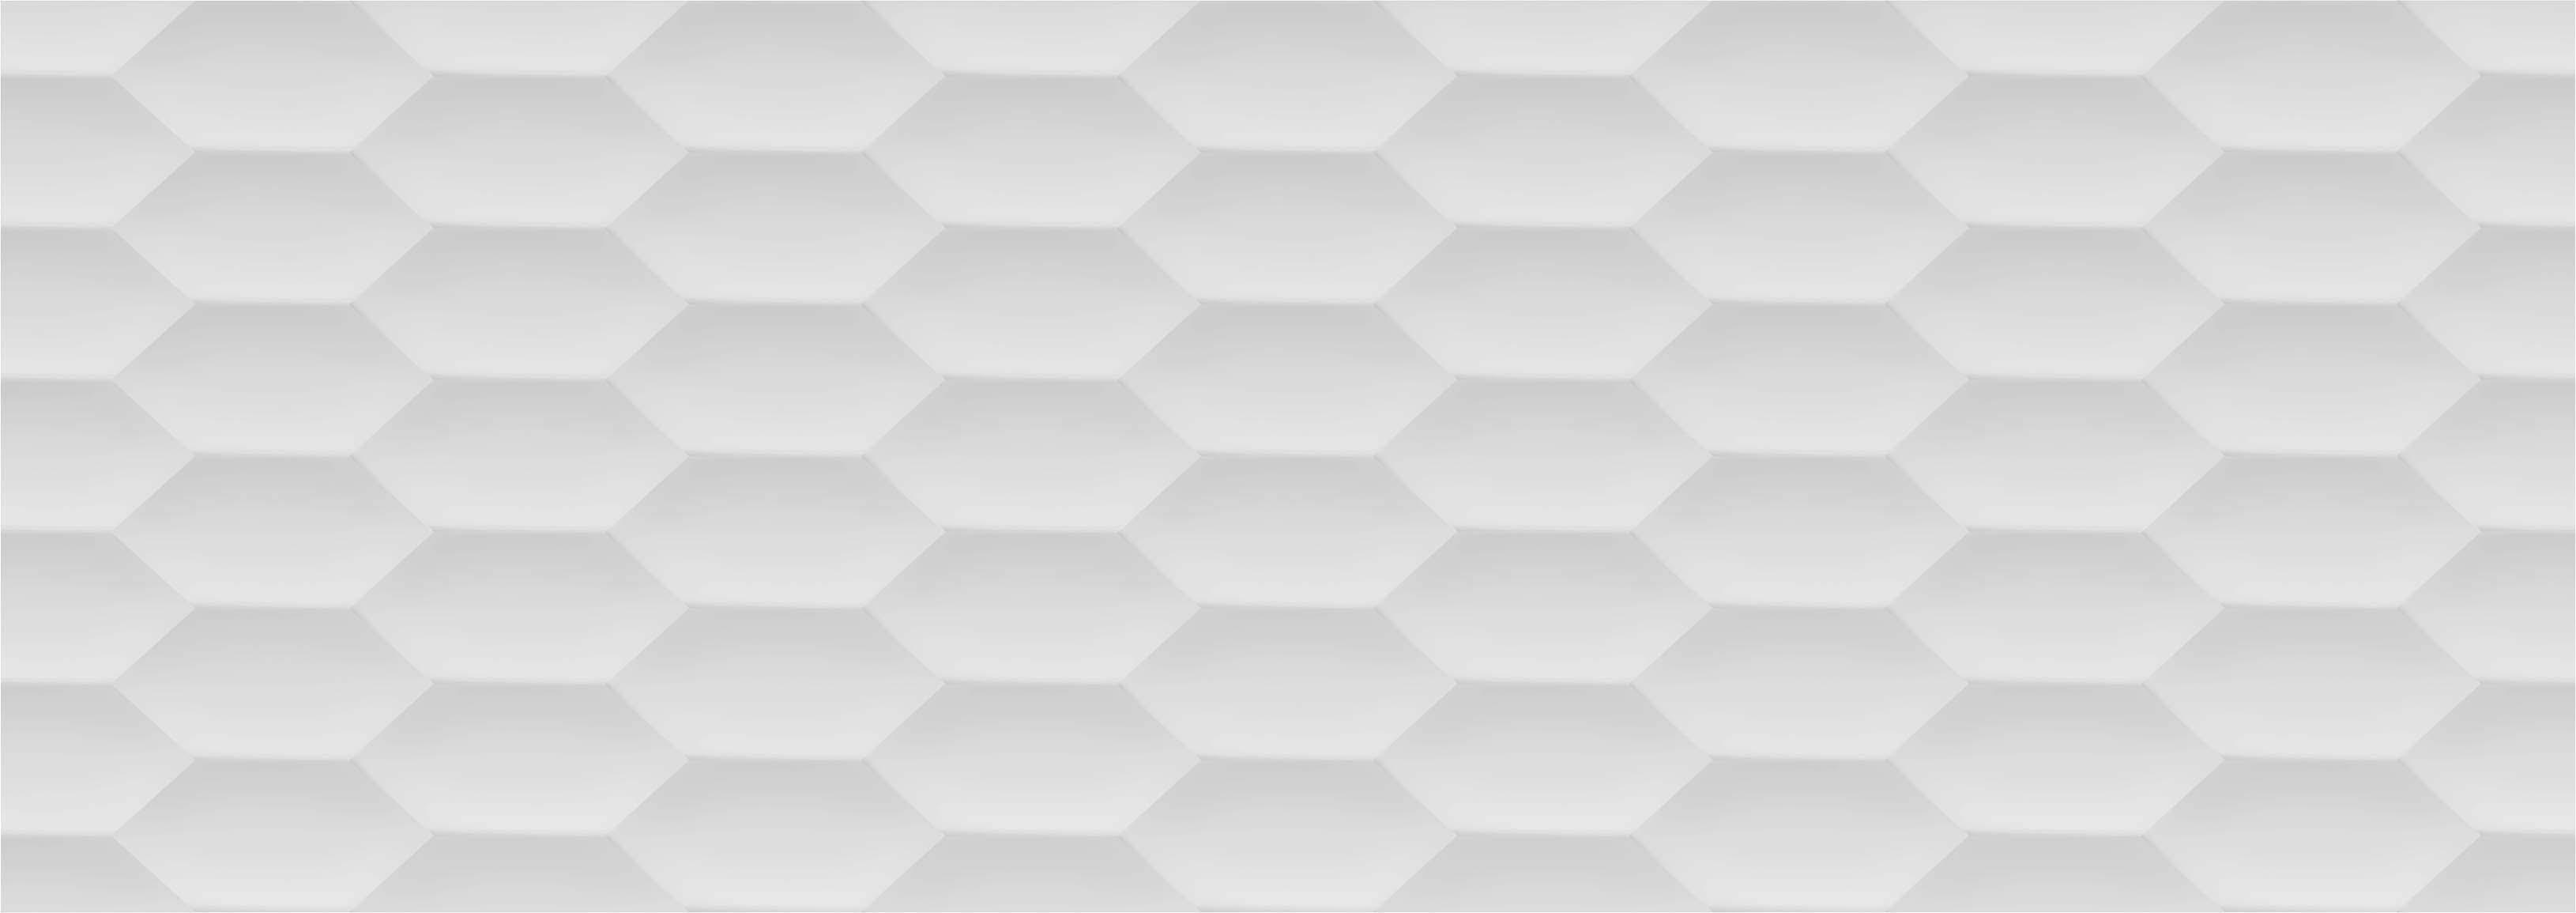 25X70 Update Fon Beyaz Glossy